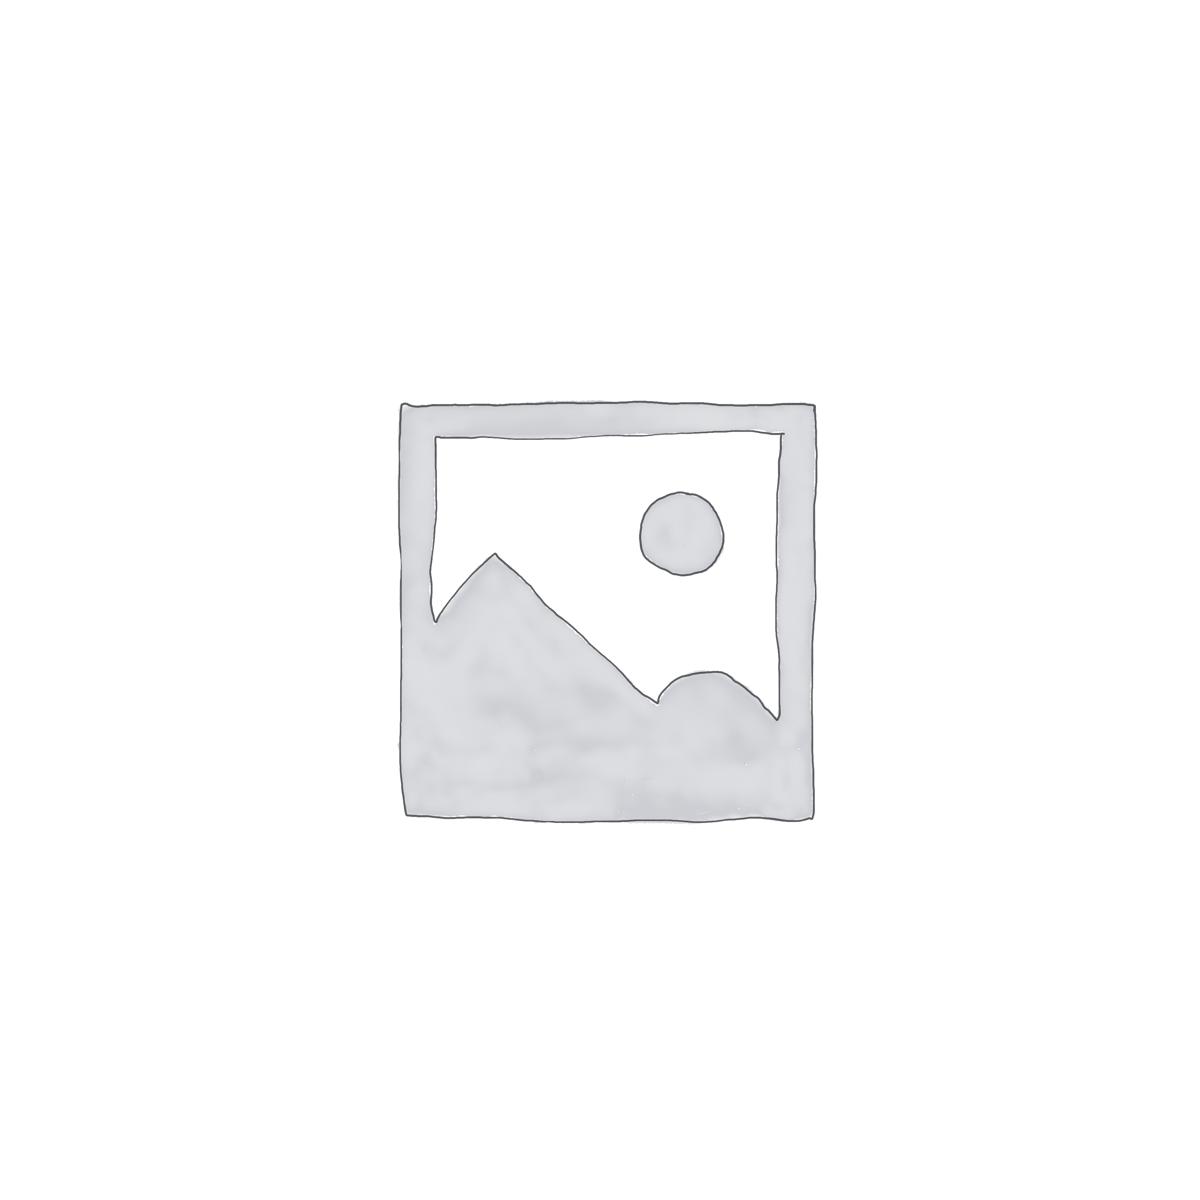 Abzug/Print hinter Acrylglas